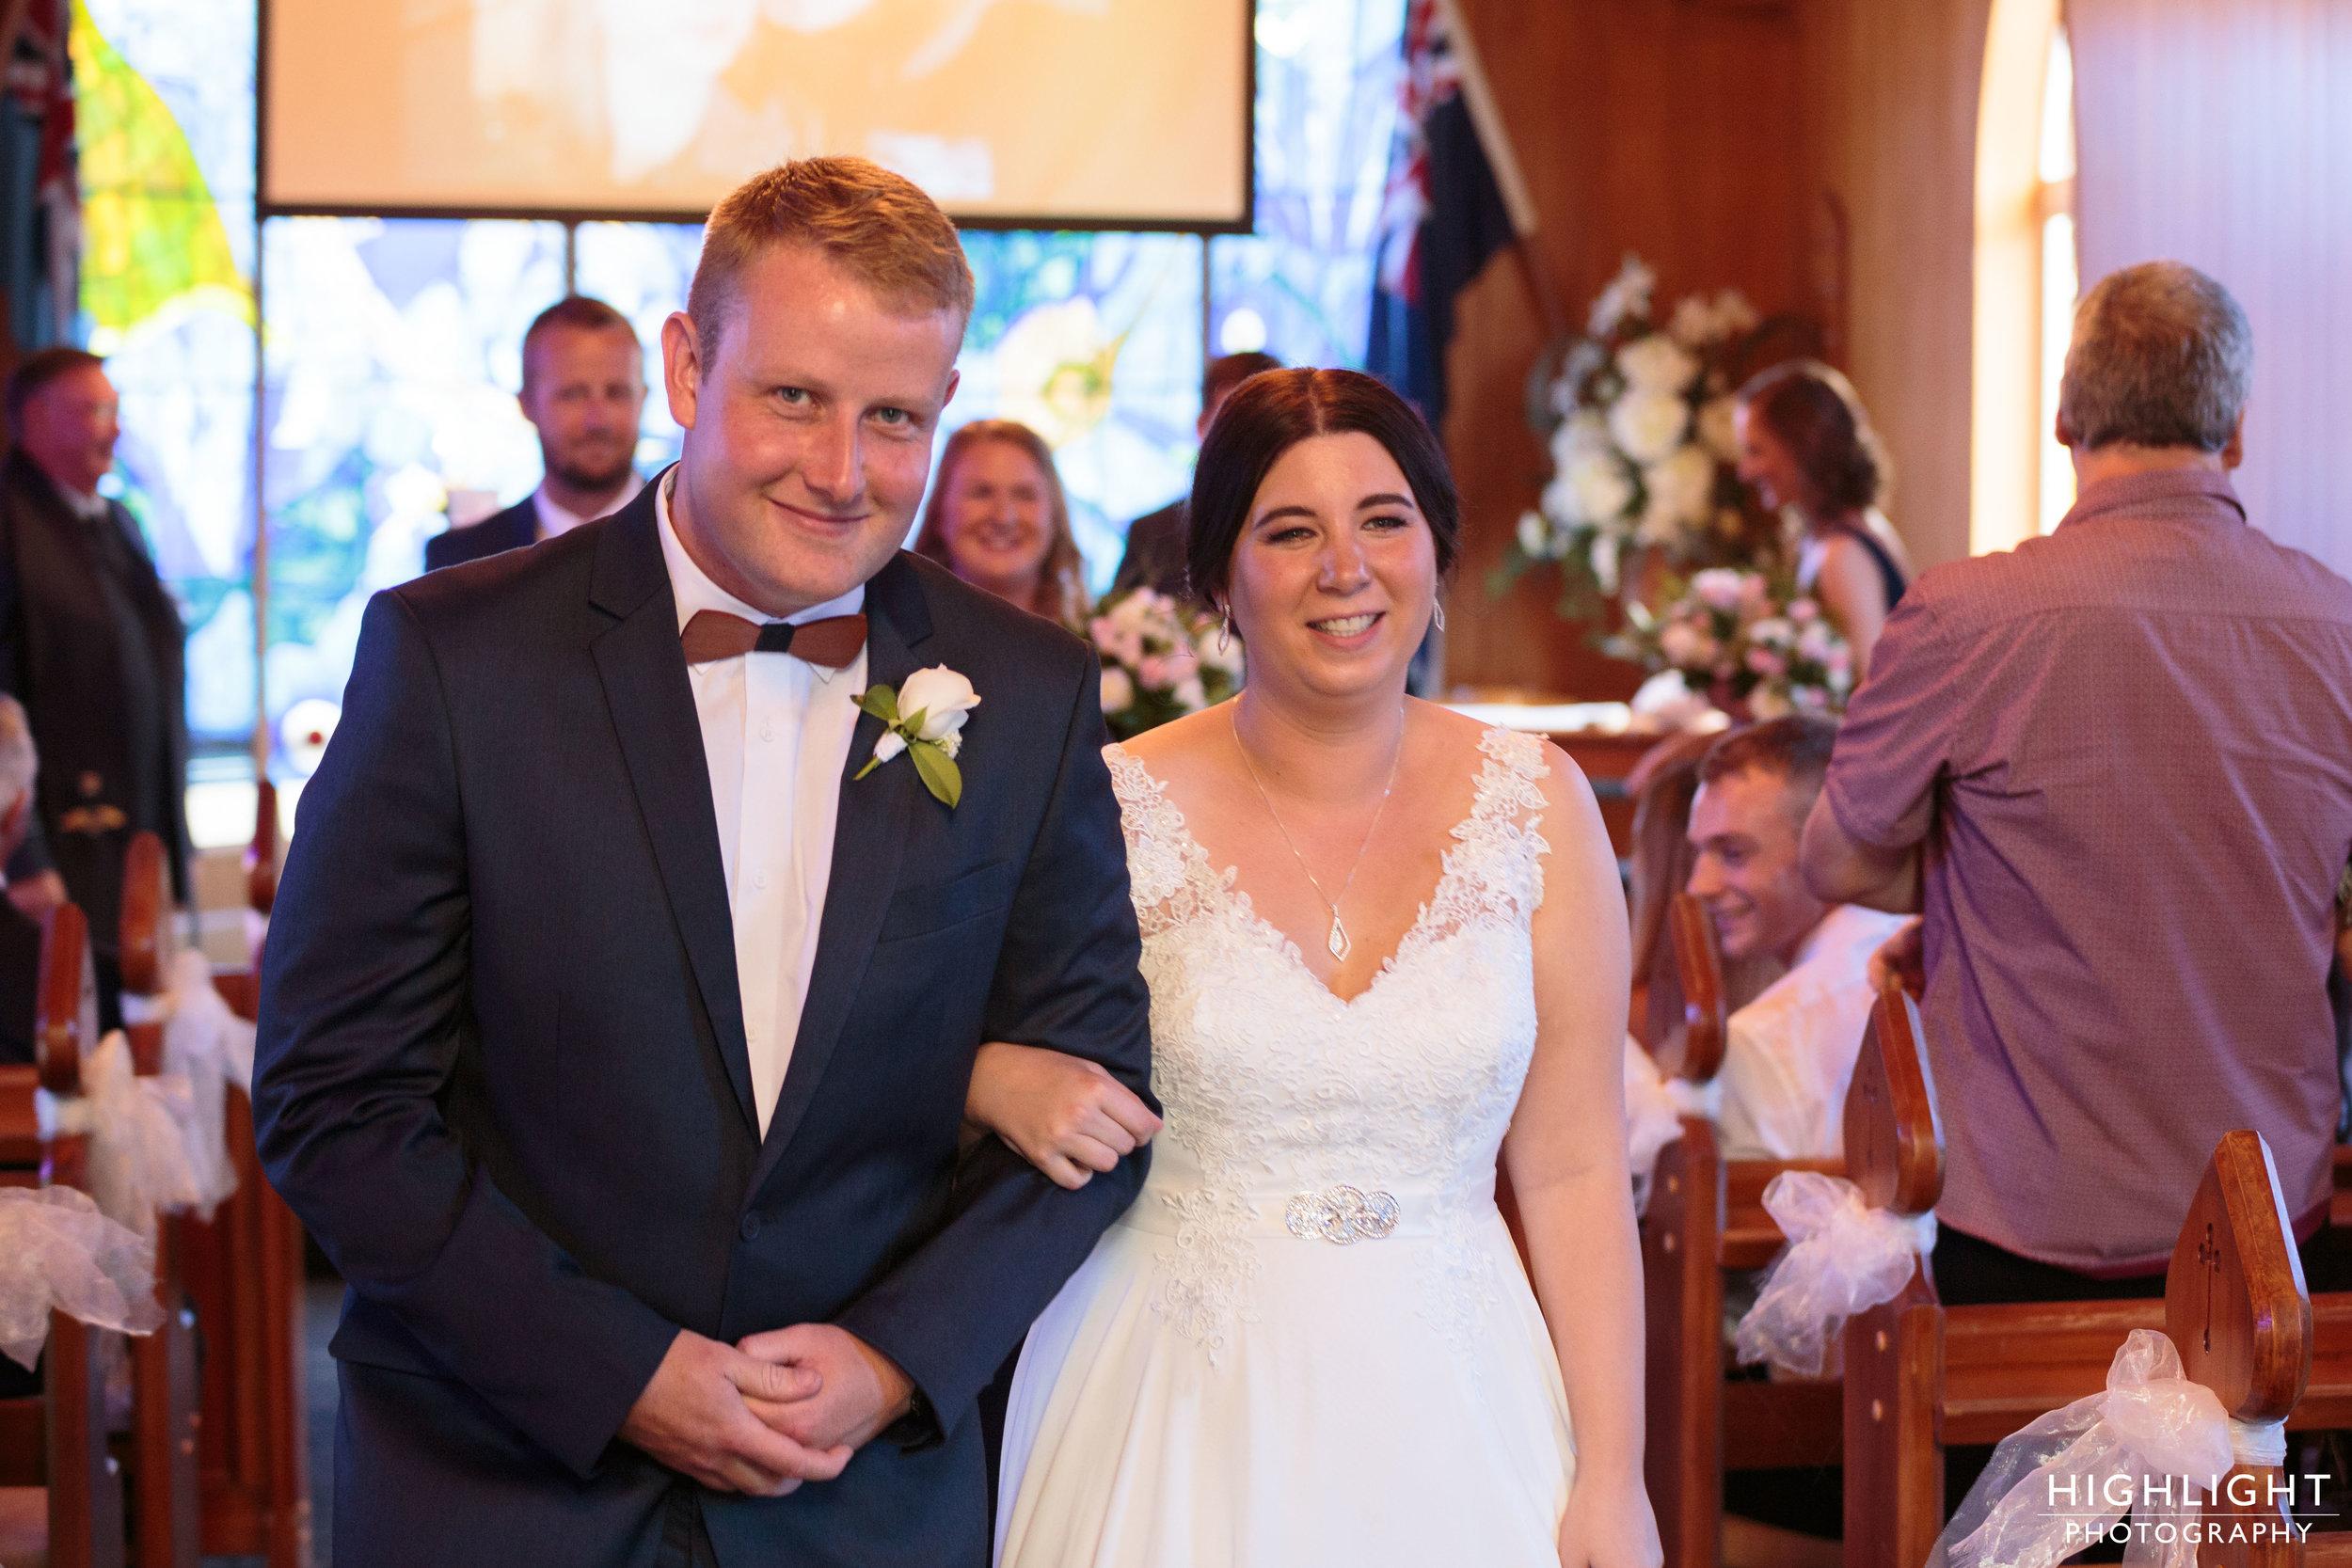 JM-2017-Highlight-wedding-photography-palmerston-north-new-zealand-78.jpg